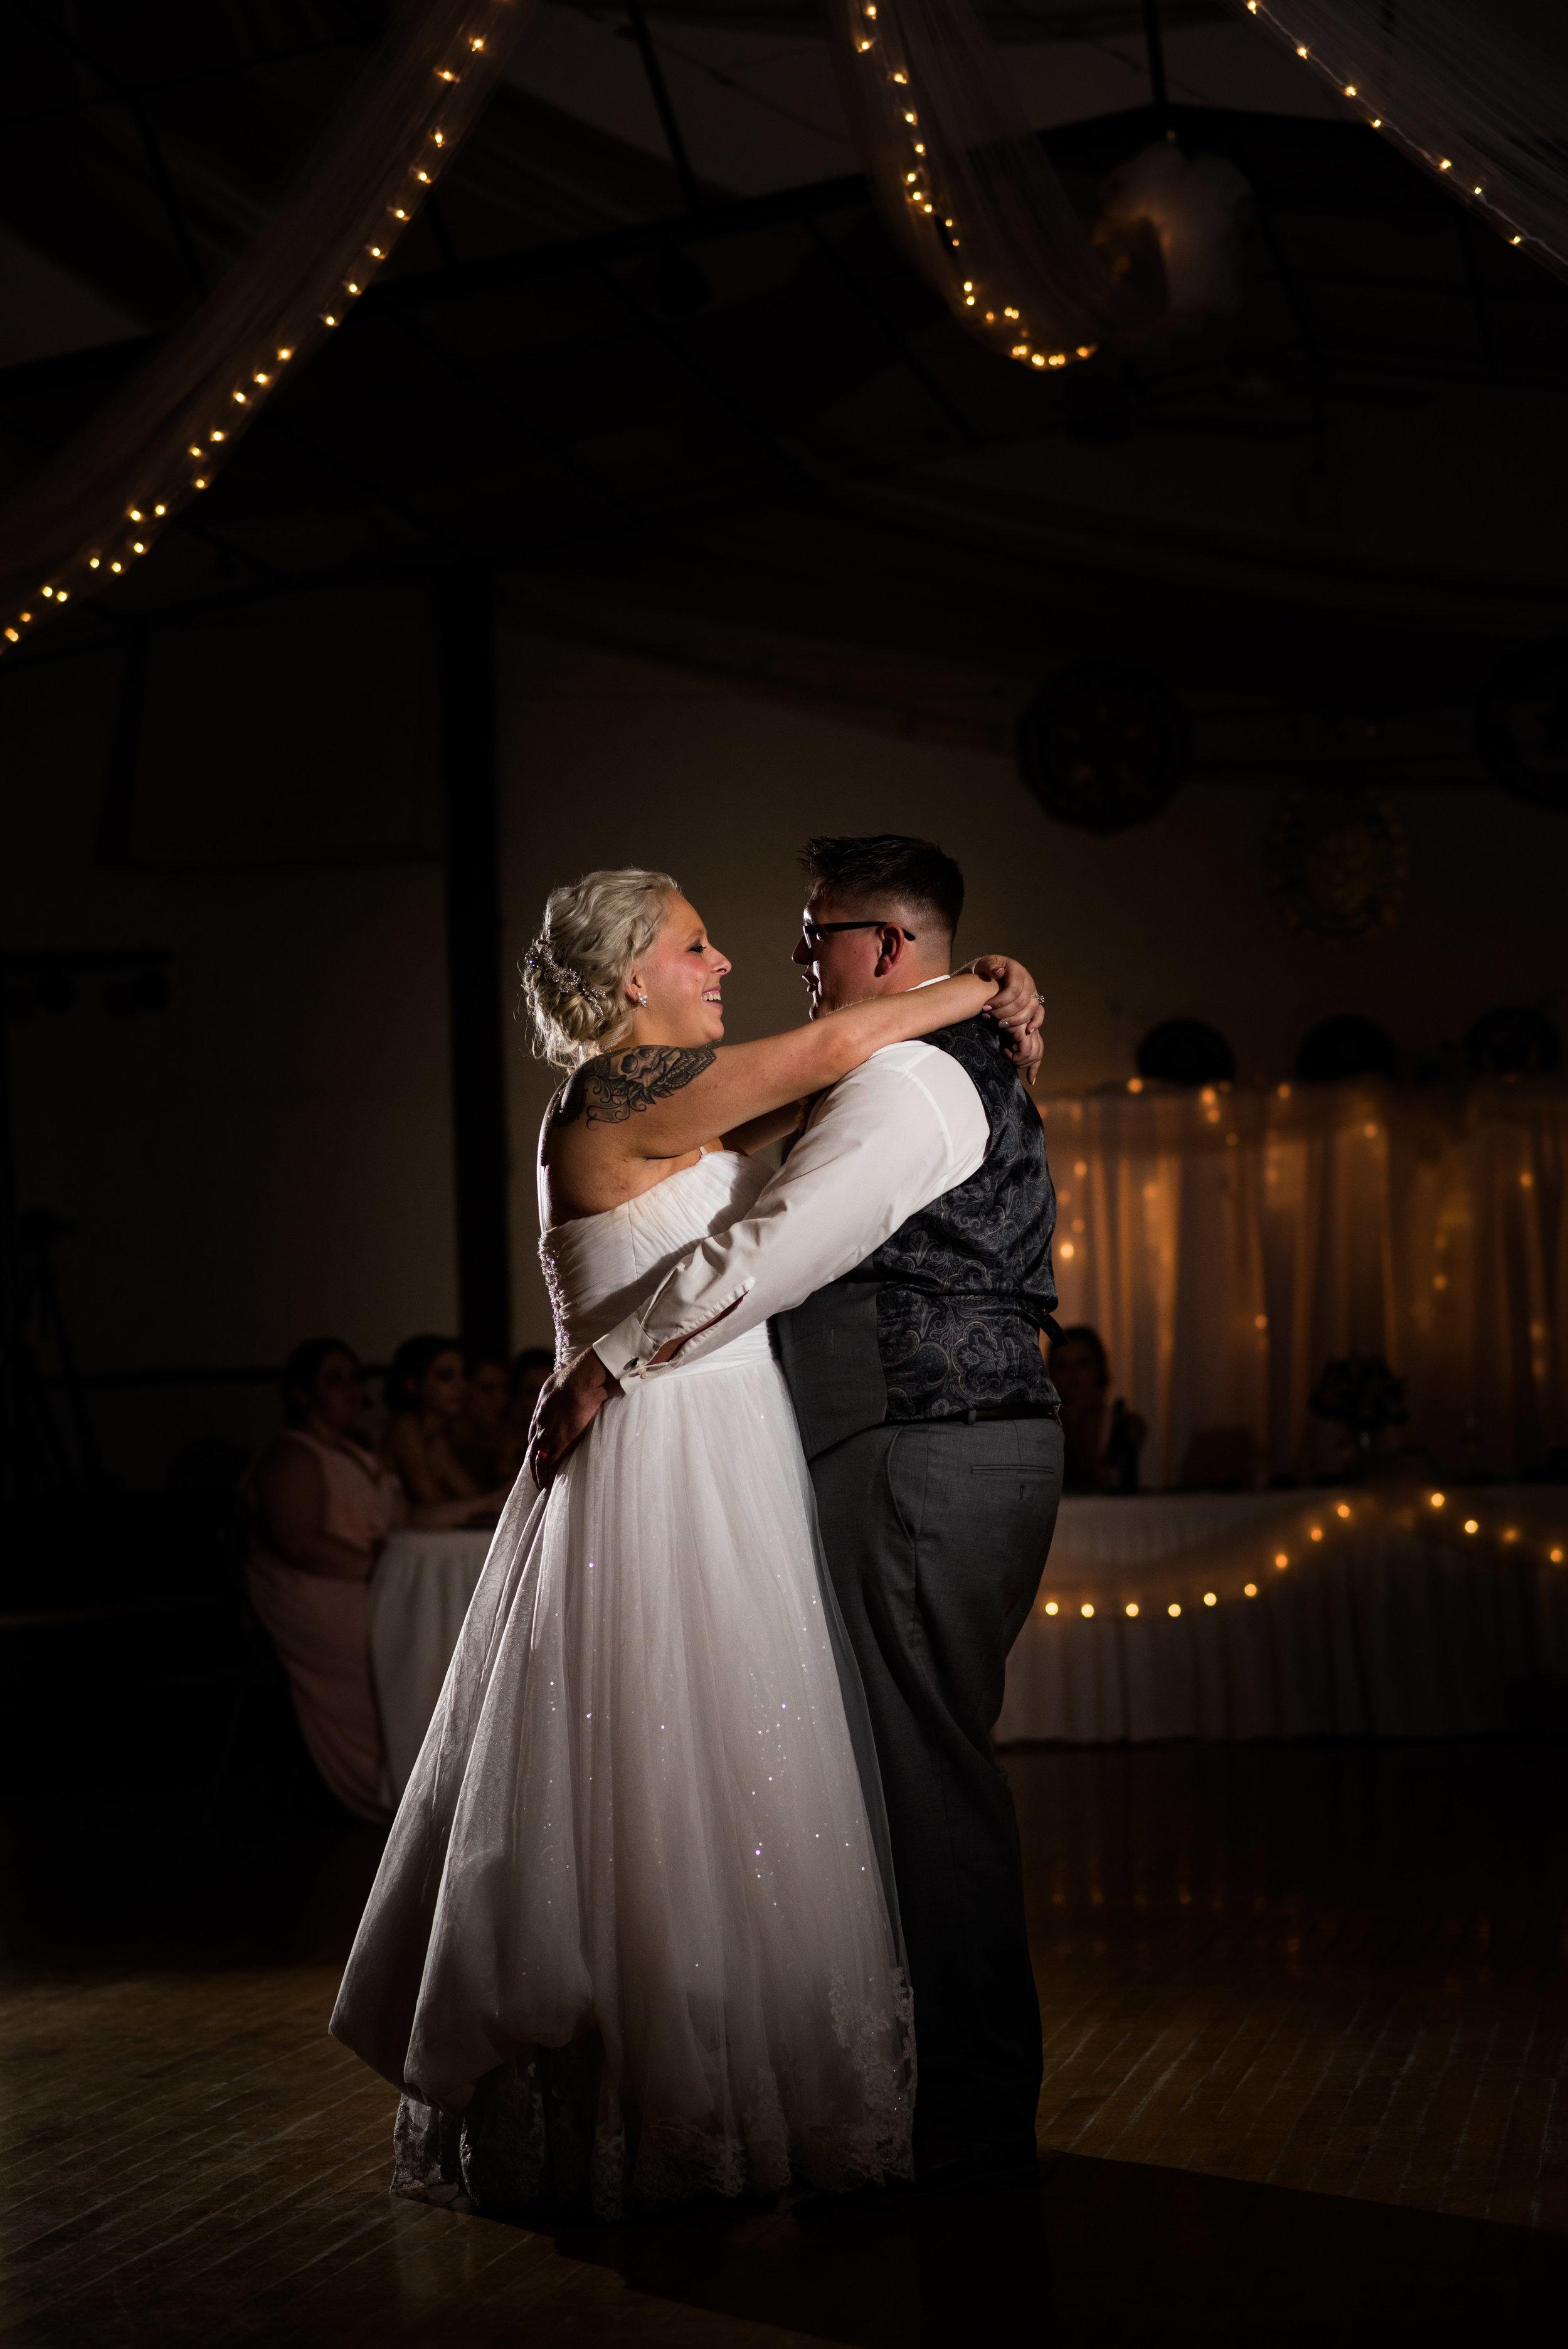 NORTHWEST OHIO WEDDING-29.jpg